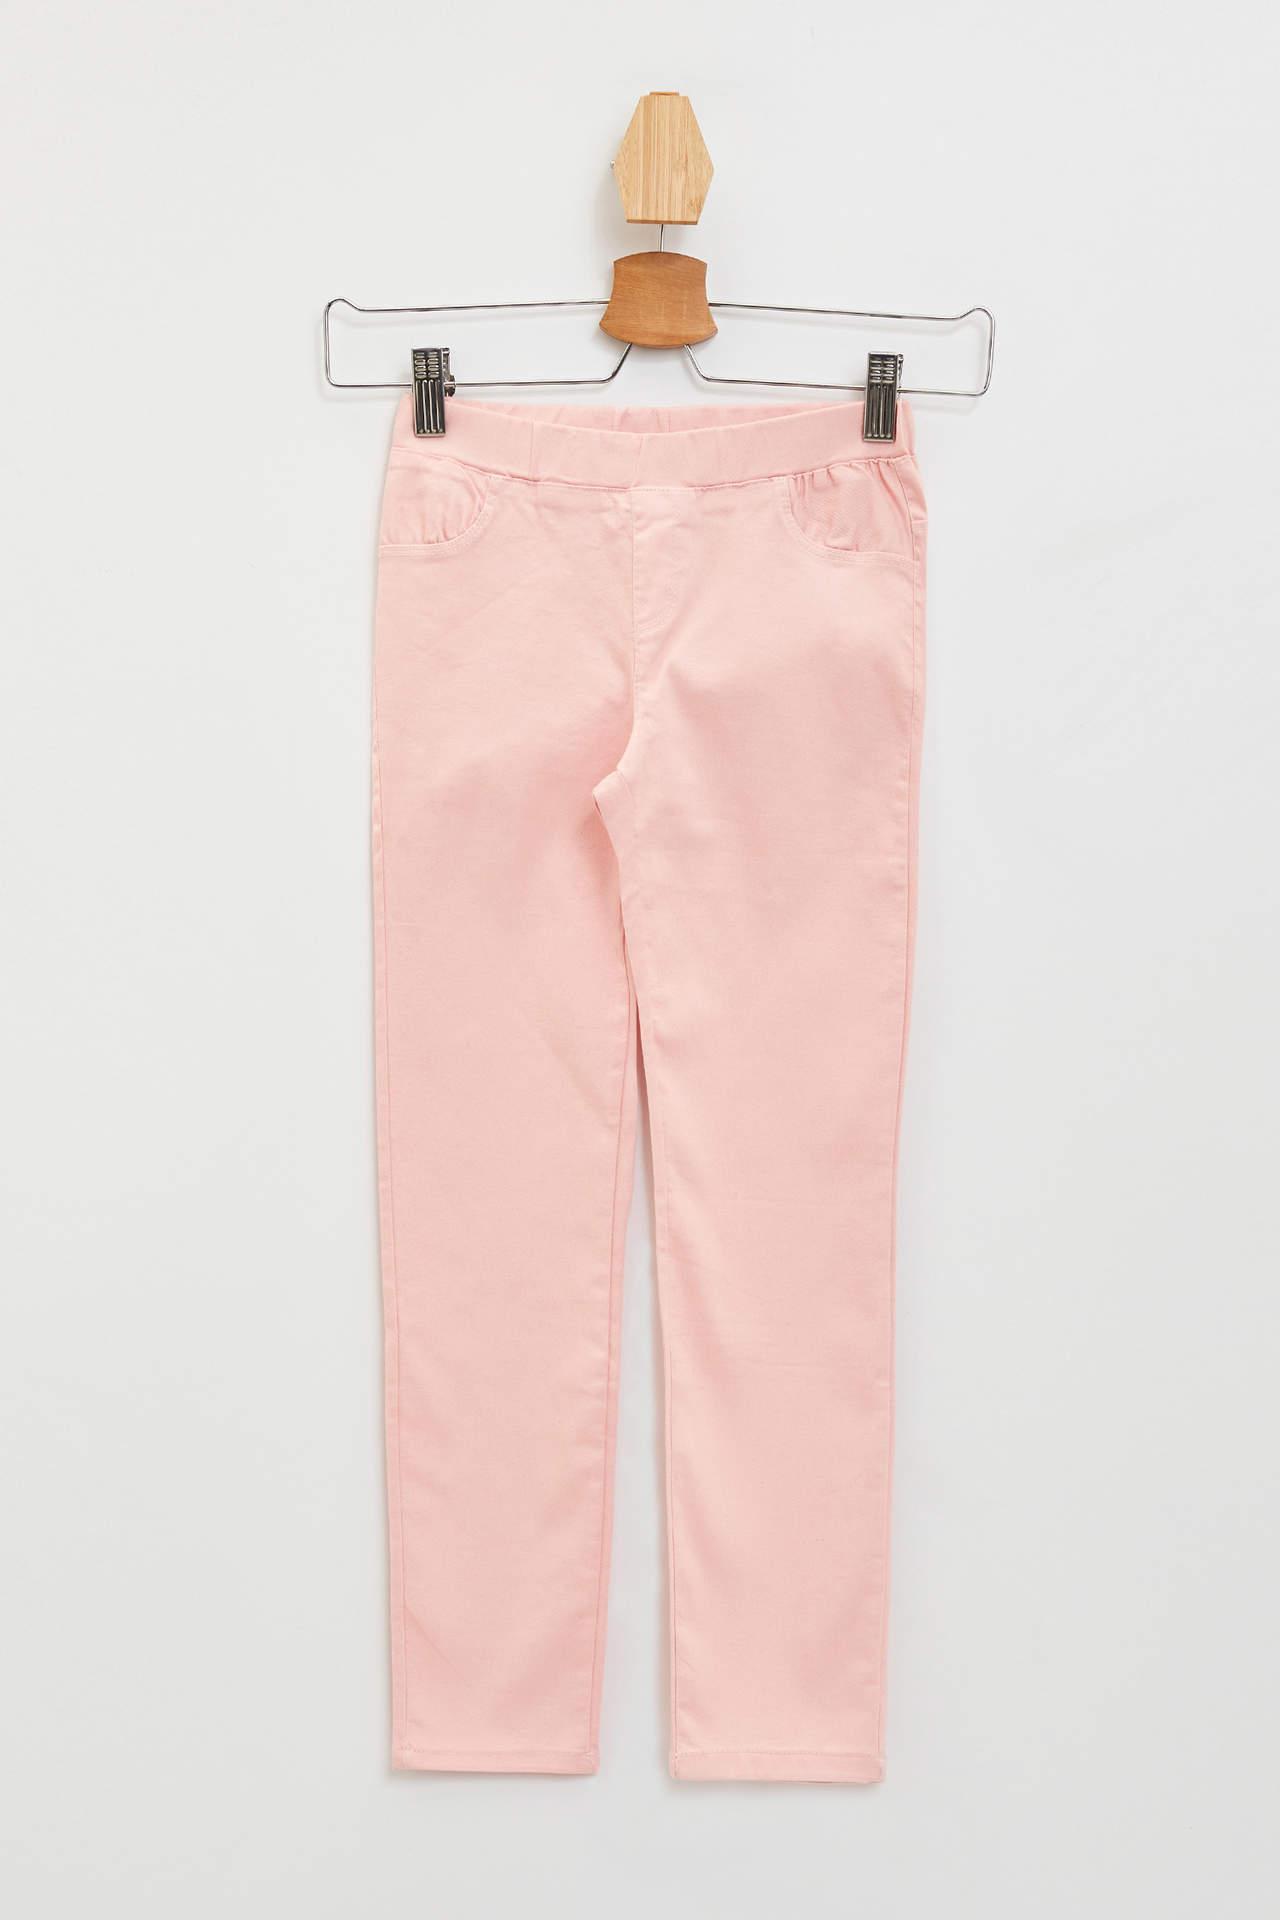 DeFacto Kız Çocuk Slim Fit Tayt Pantolon Pembe female